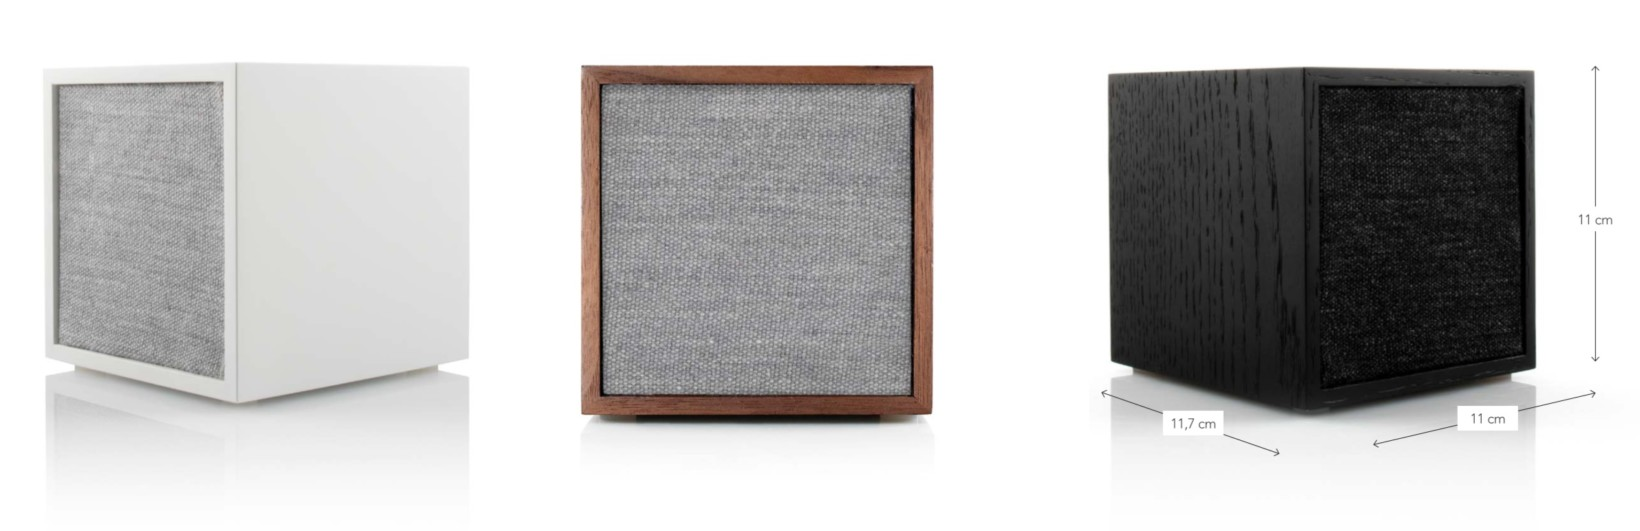 tivoli-audio-art-cube